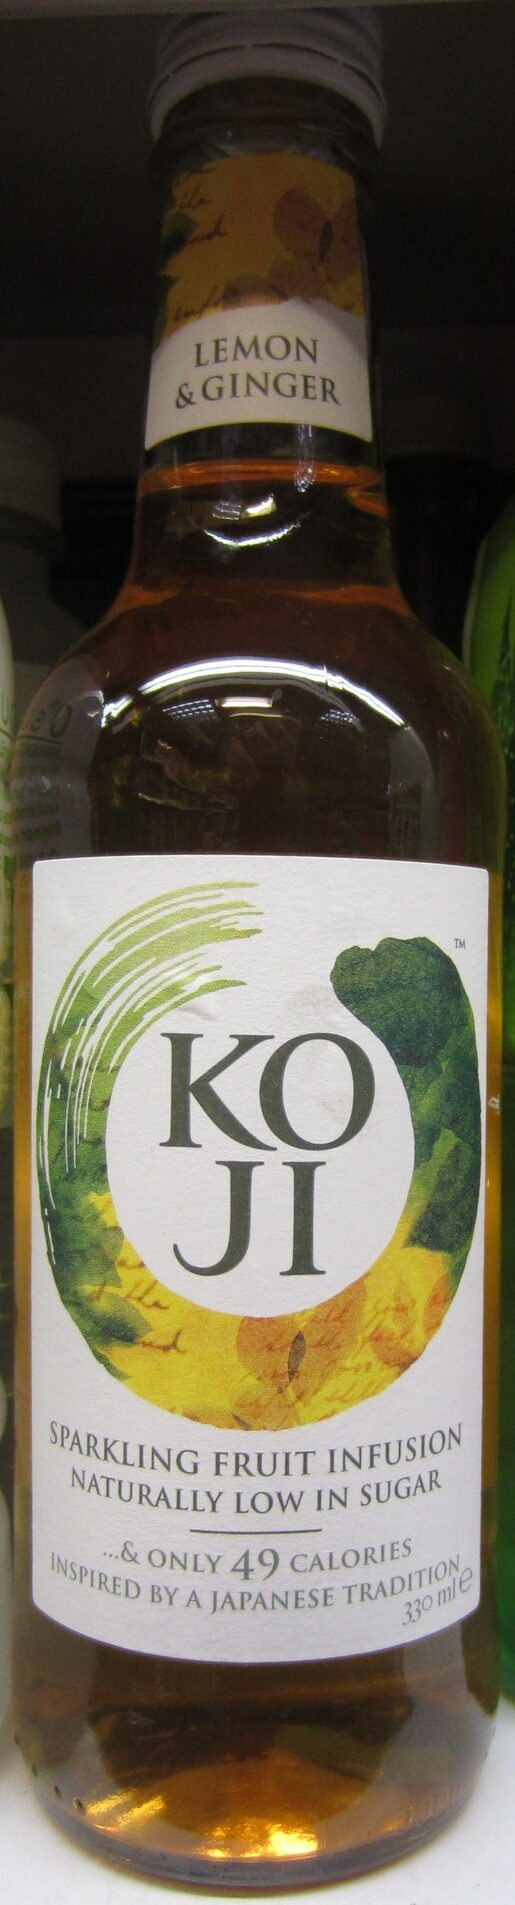 KOJI Lemon & Ginger - Product